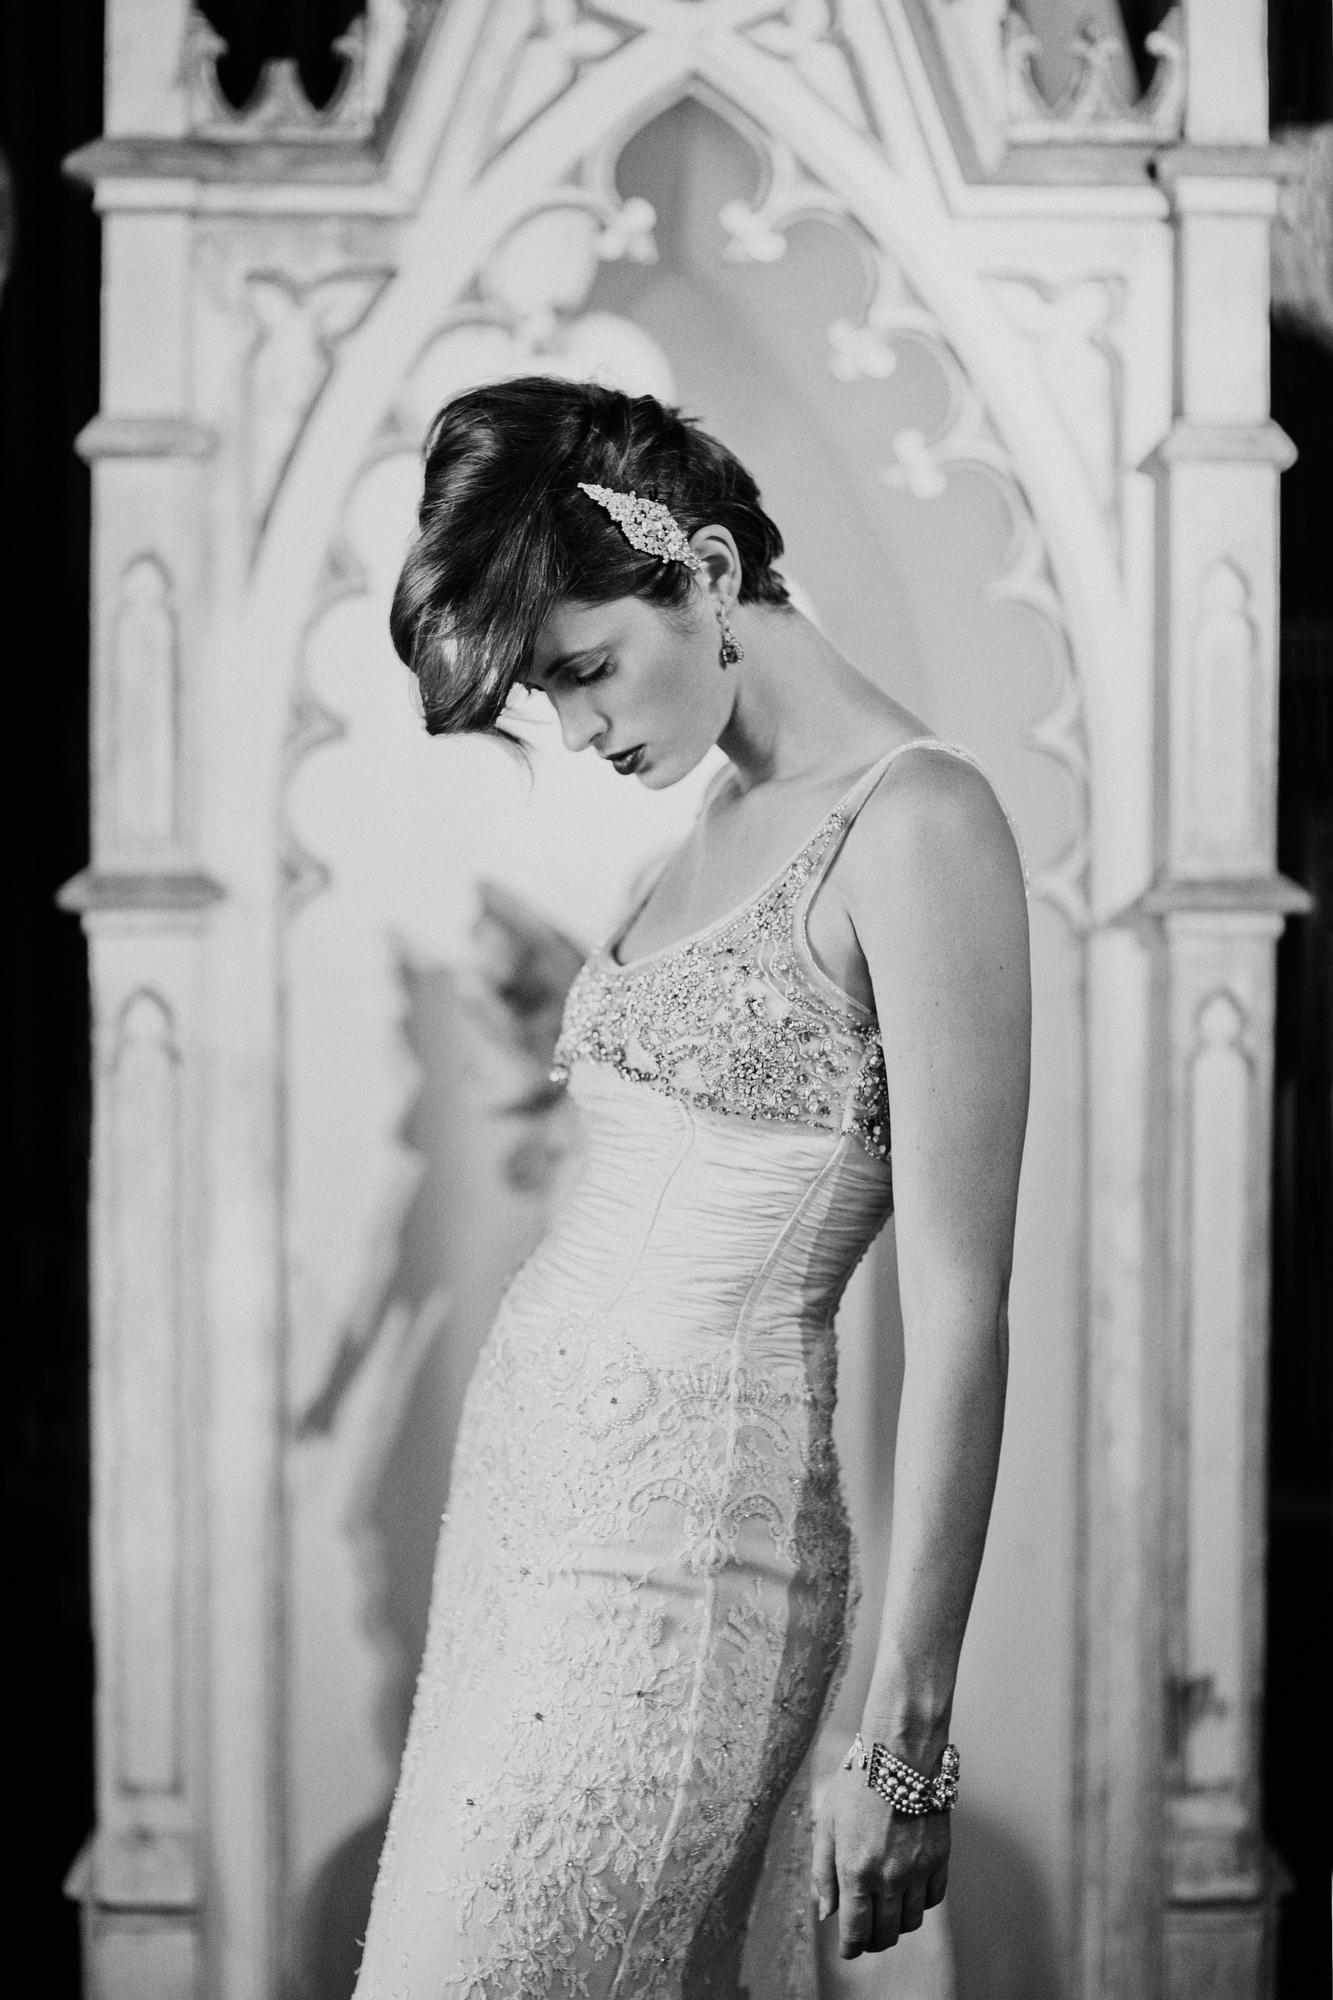 jennifer-skog-bridal-fashion-photographer-lifestyle-0002.jpg